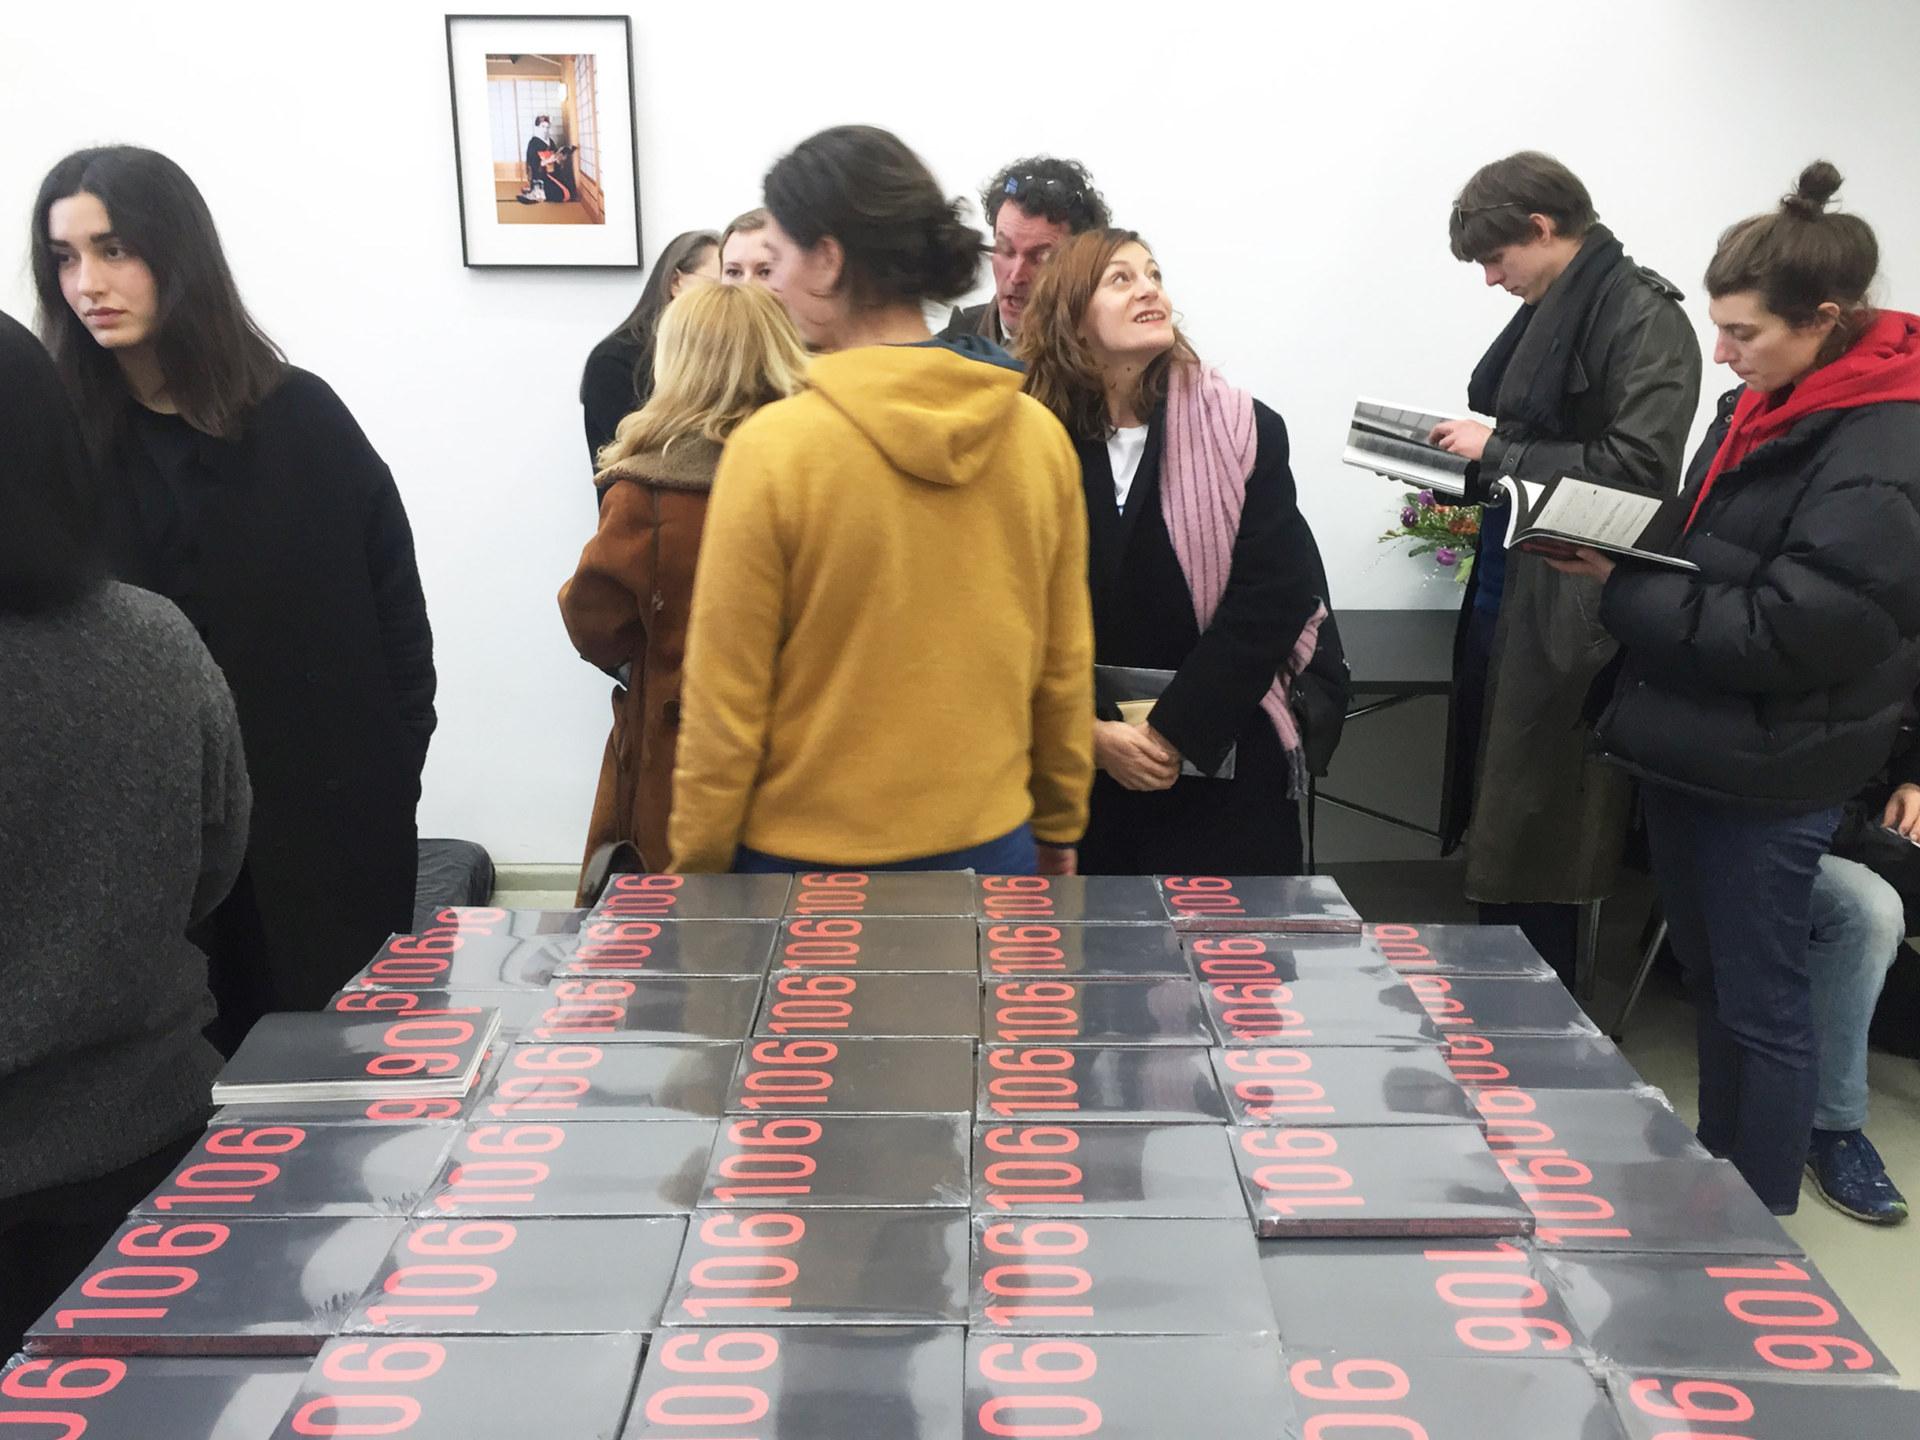 Klasse John Morgan Launch of Raum 106, Issue 0